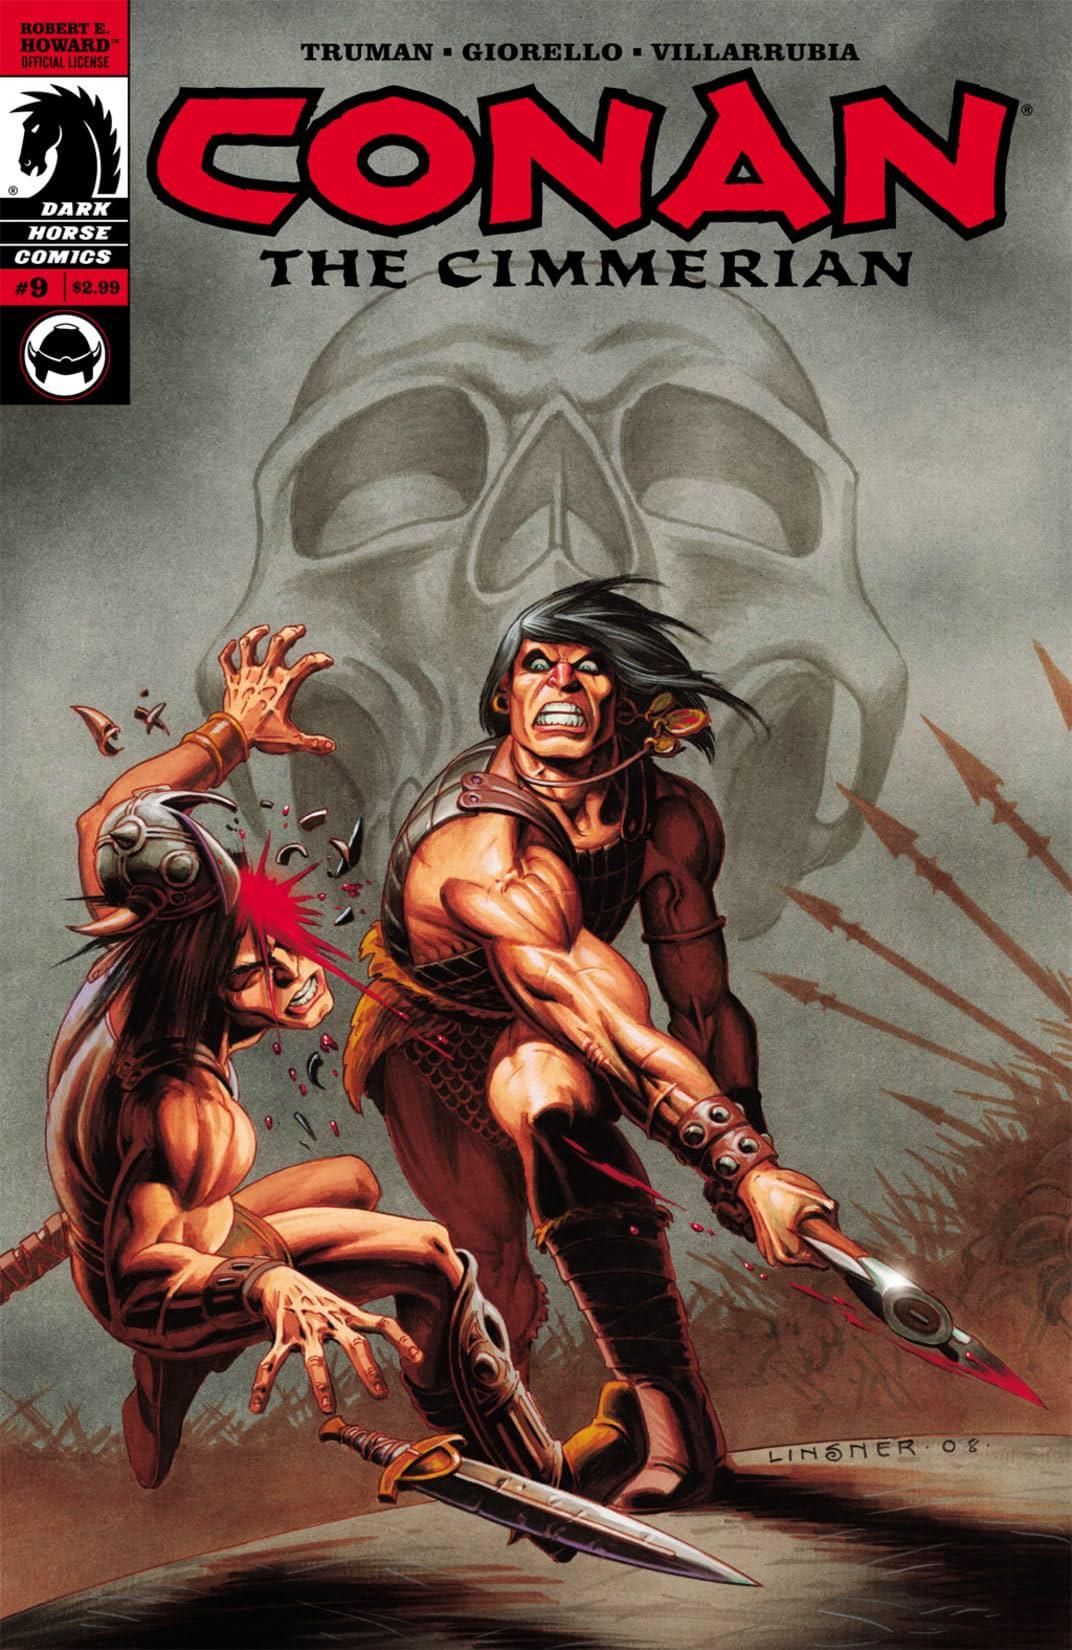 Conan the Cimmerian #9